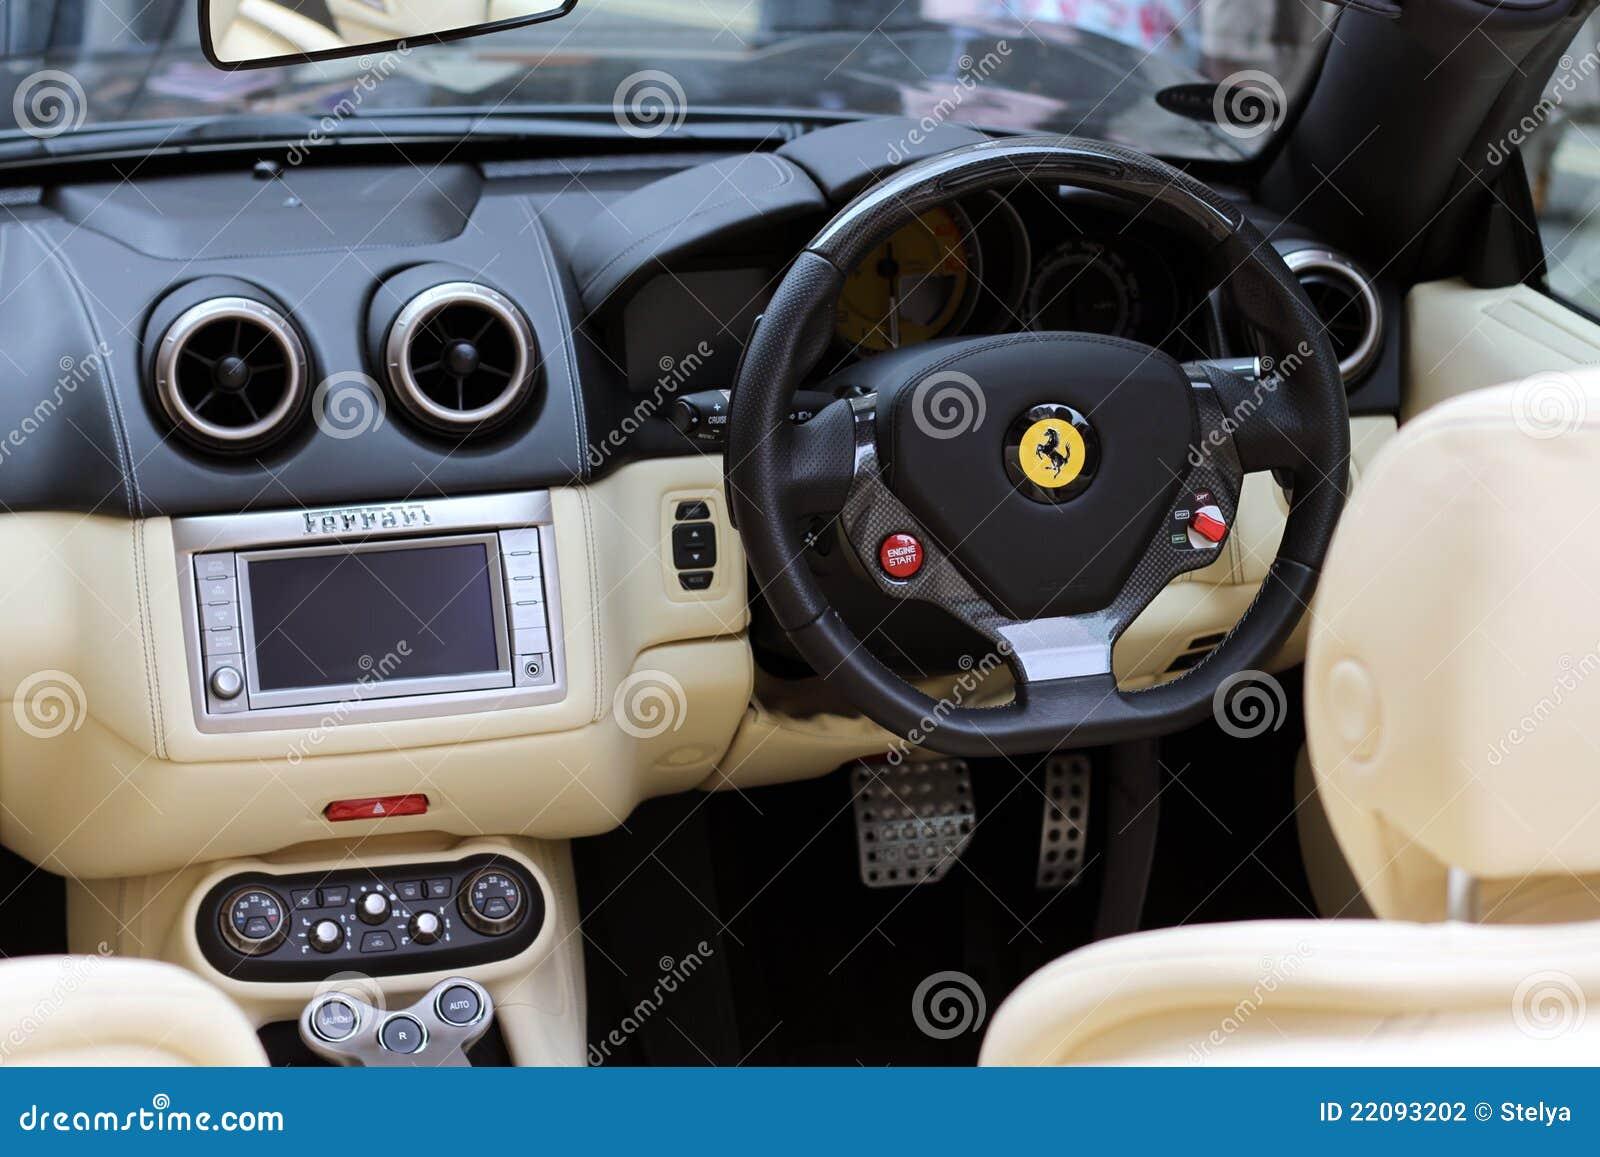 Car interior photos - Car Dashboard Ferrari Interior